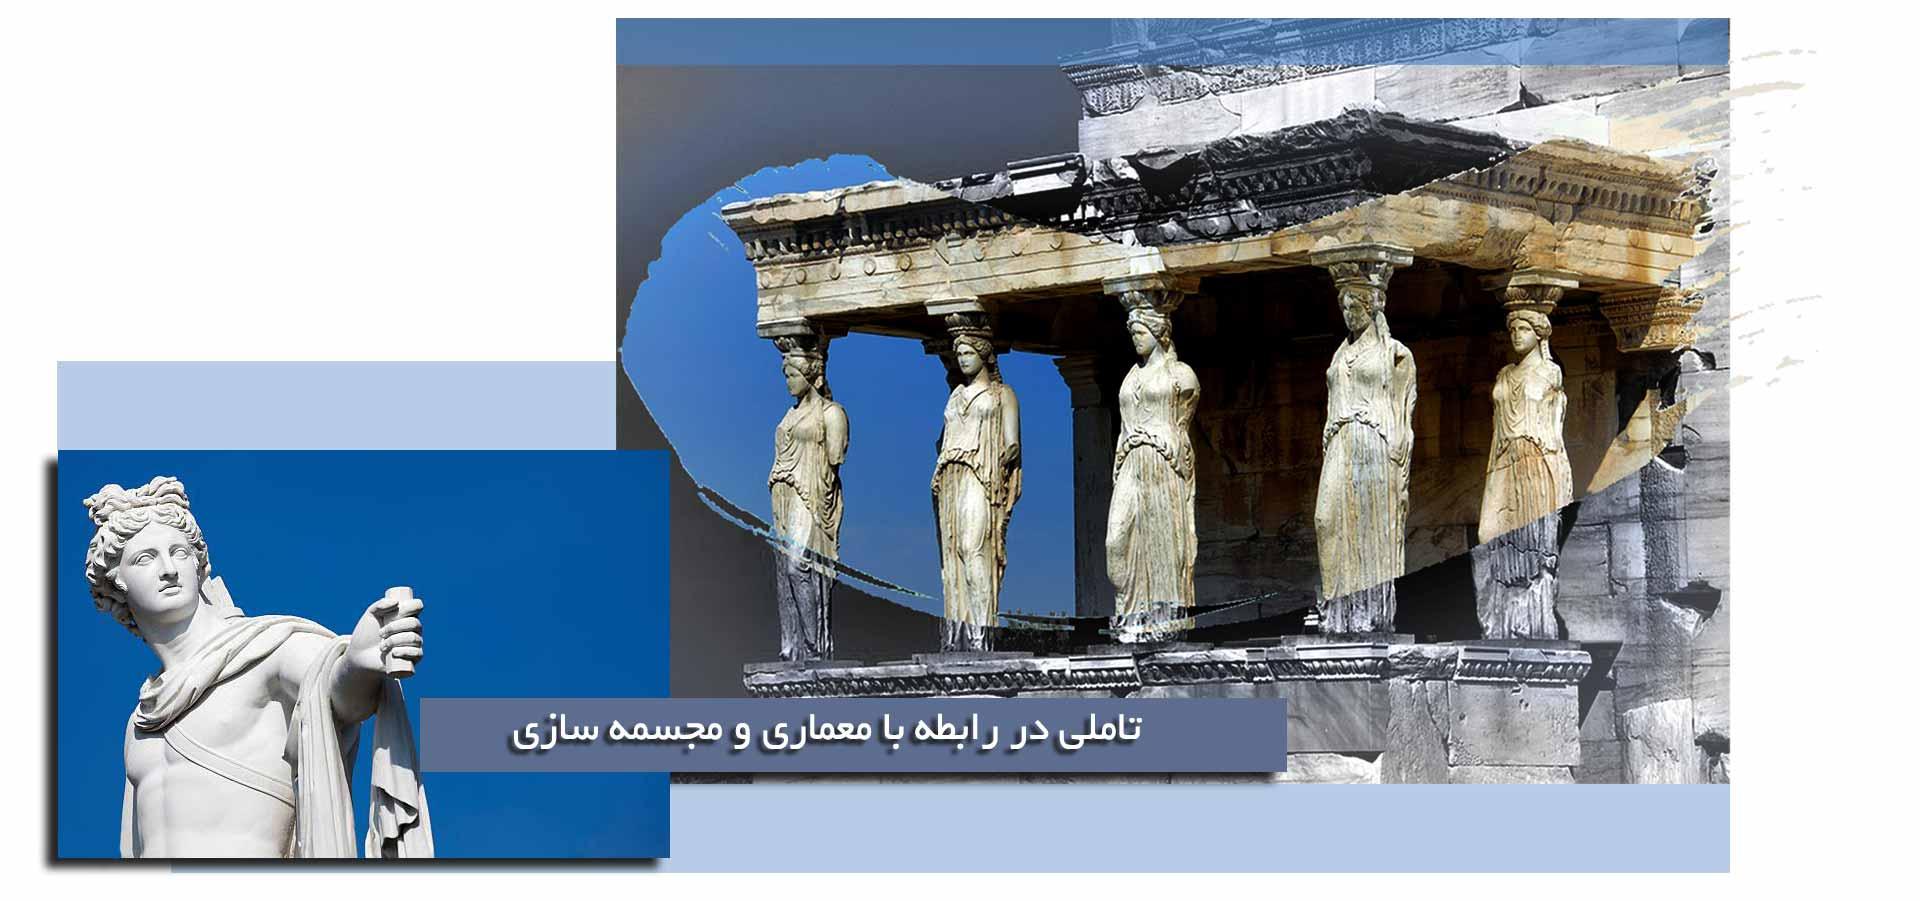 ARCHITCT sculpture 10 2 - تاملی در رابطه معماری و مجسمه سازی